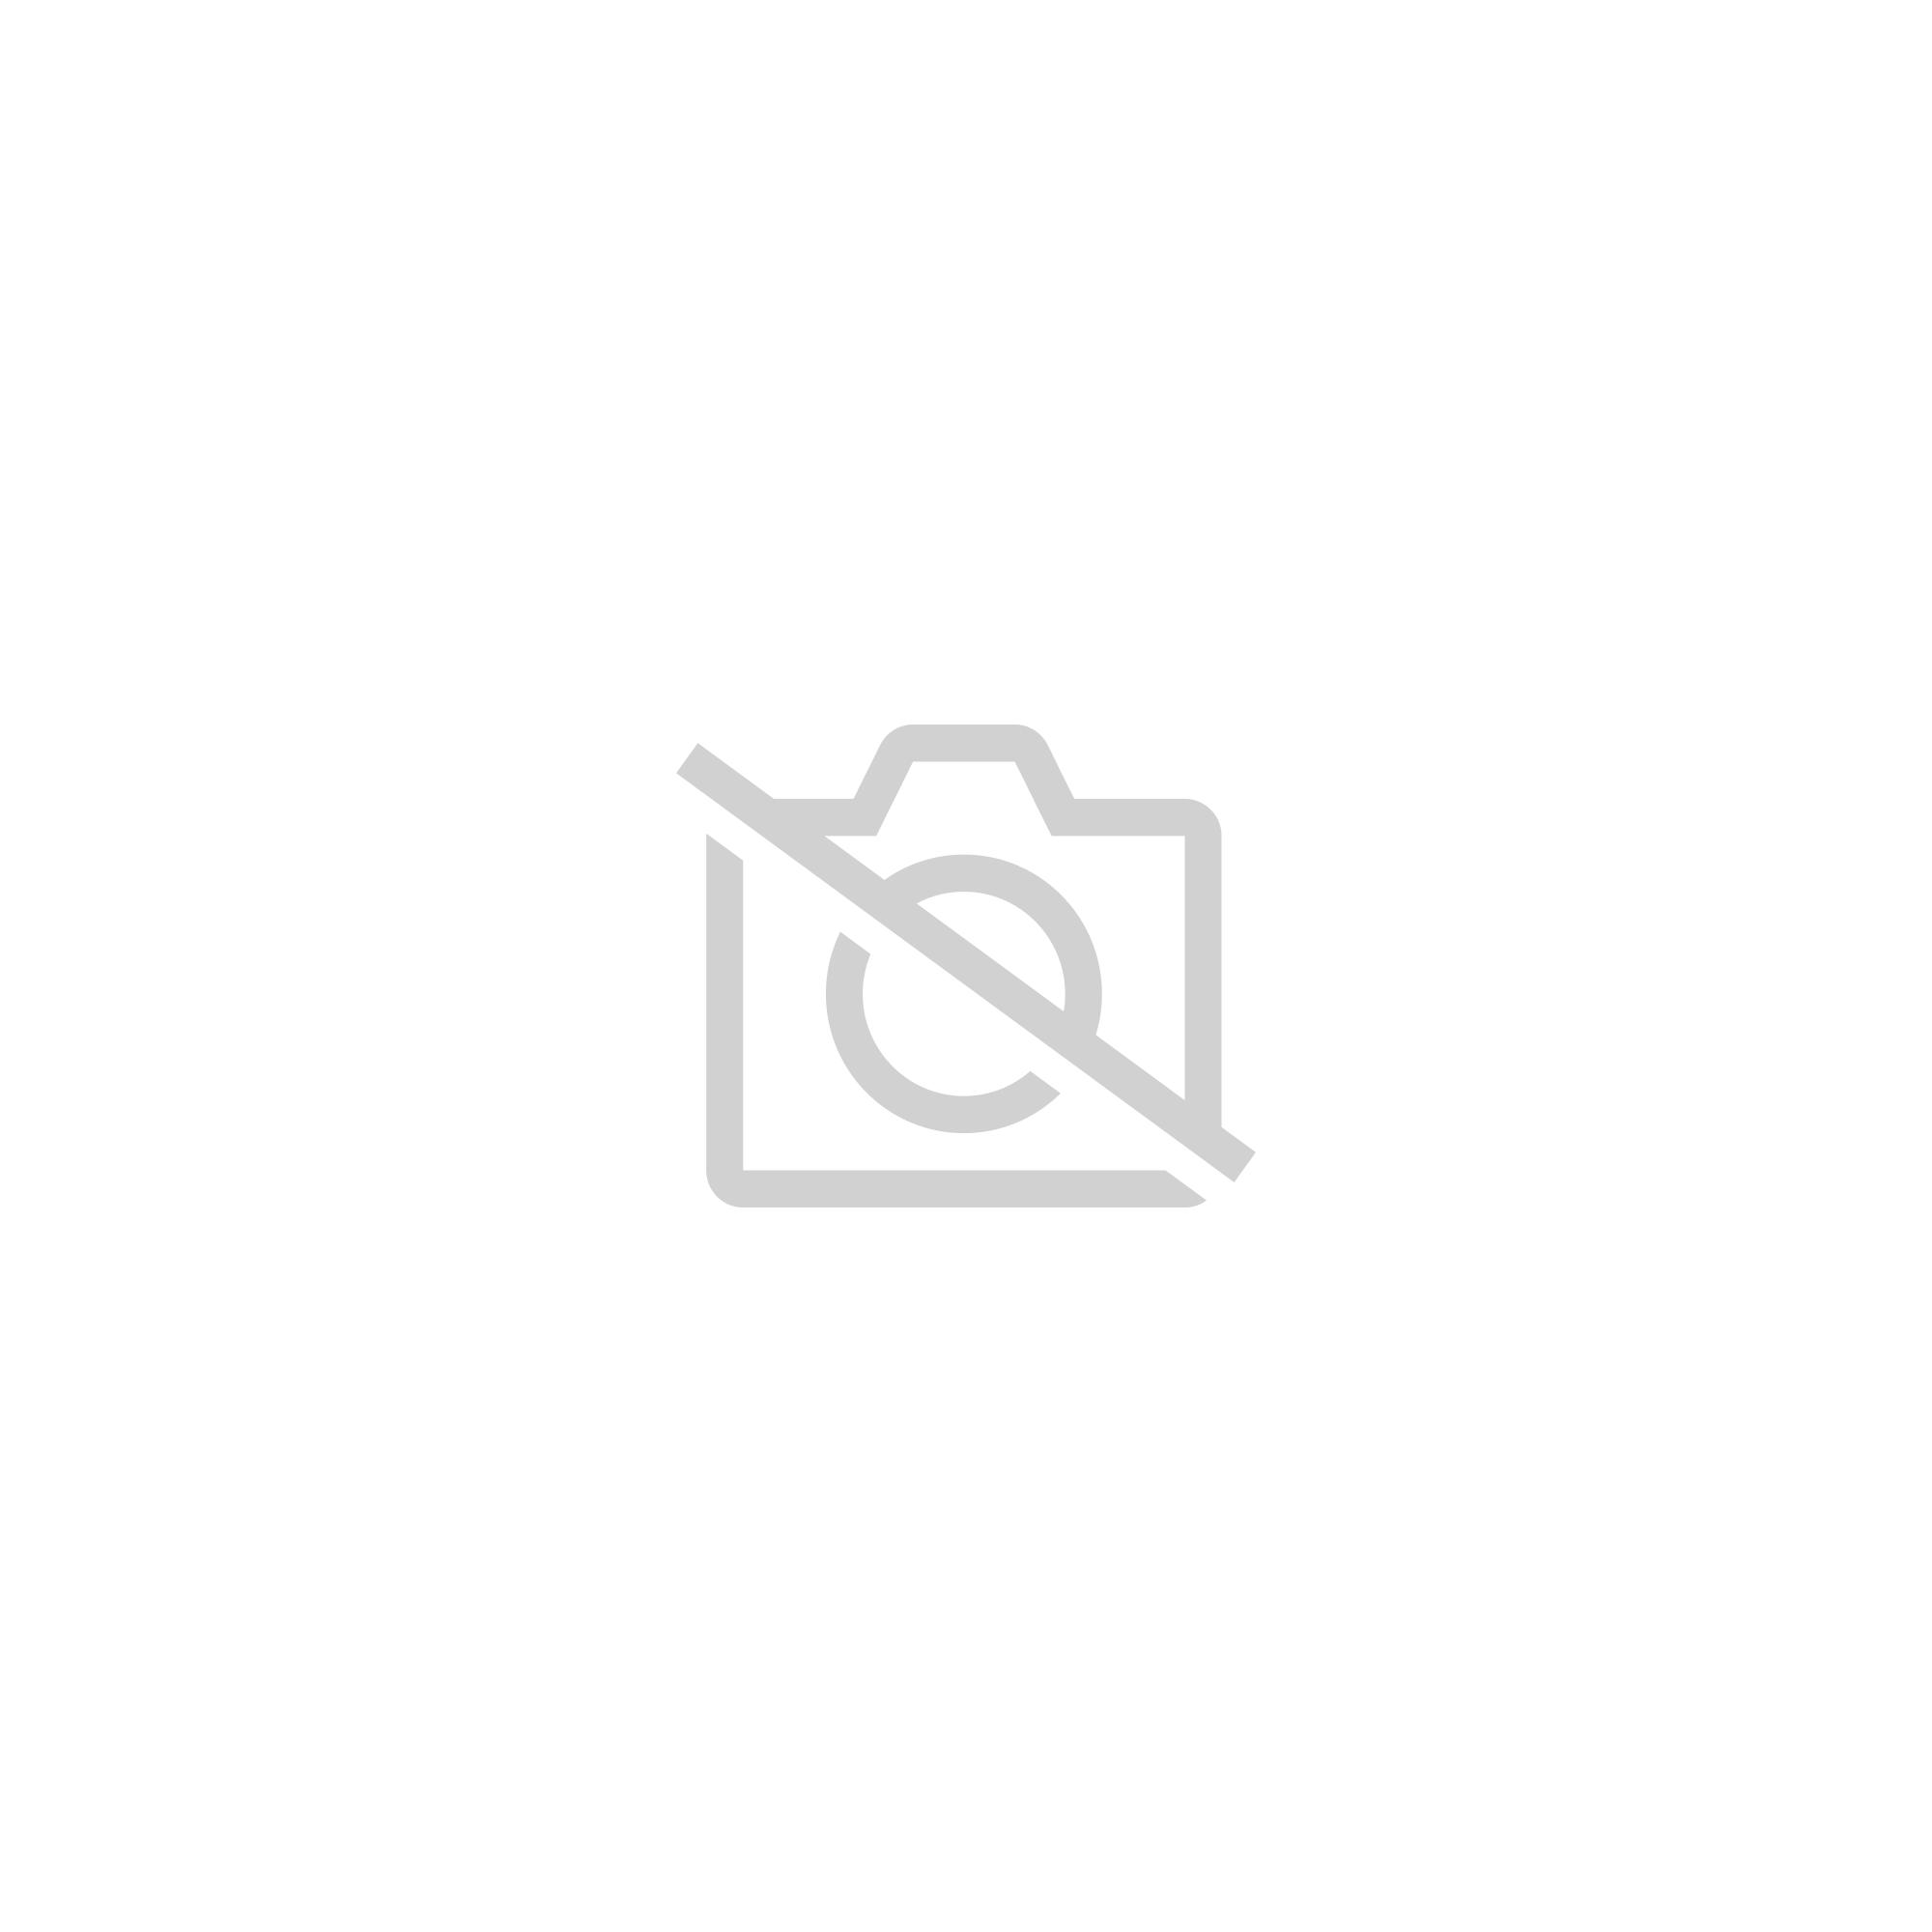 finlandek canap droit convertible kulma 2 places 146x81x70 cm tissu gris. Black Bedroom Furniture Sets. Home Design Ideas